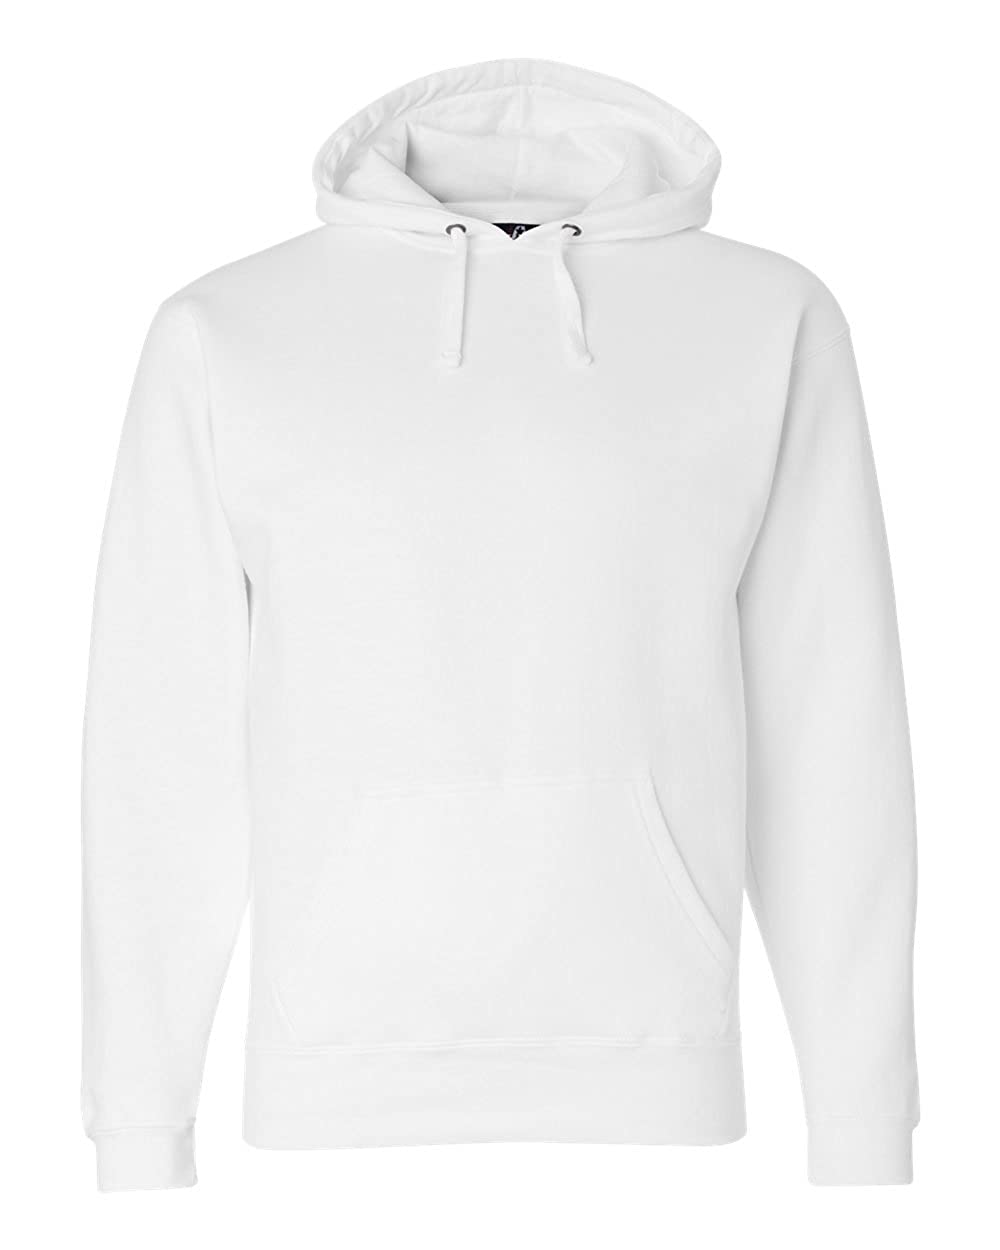 J America 8824 Premium Hooded Sweatshirt